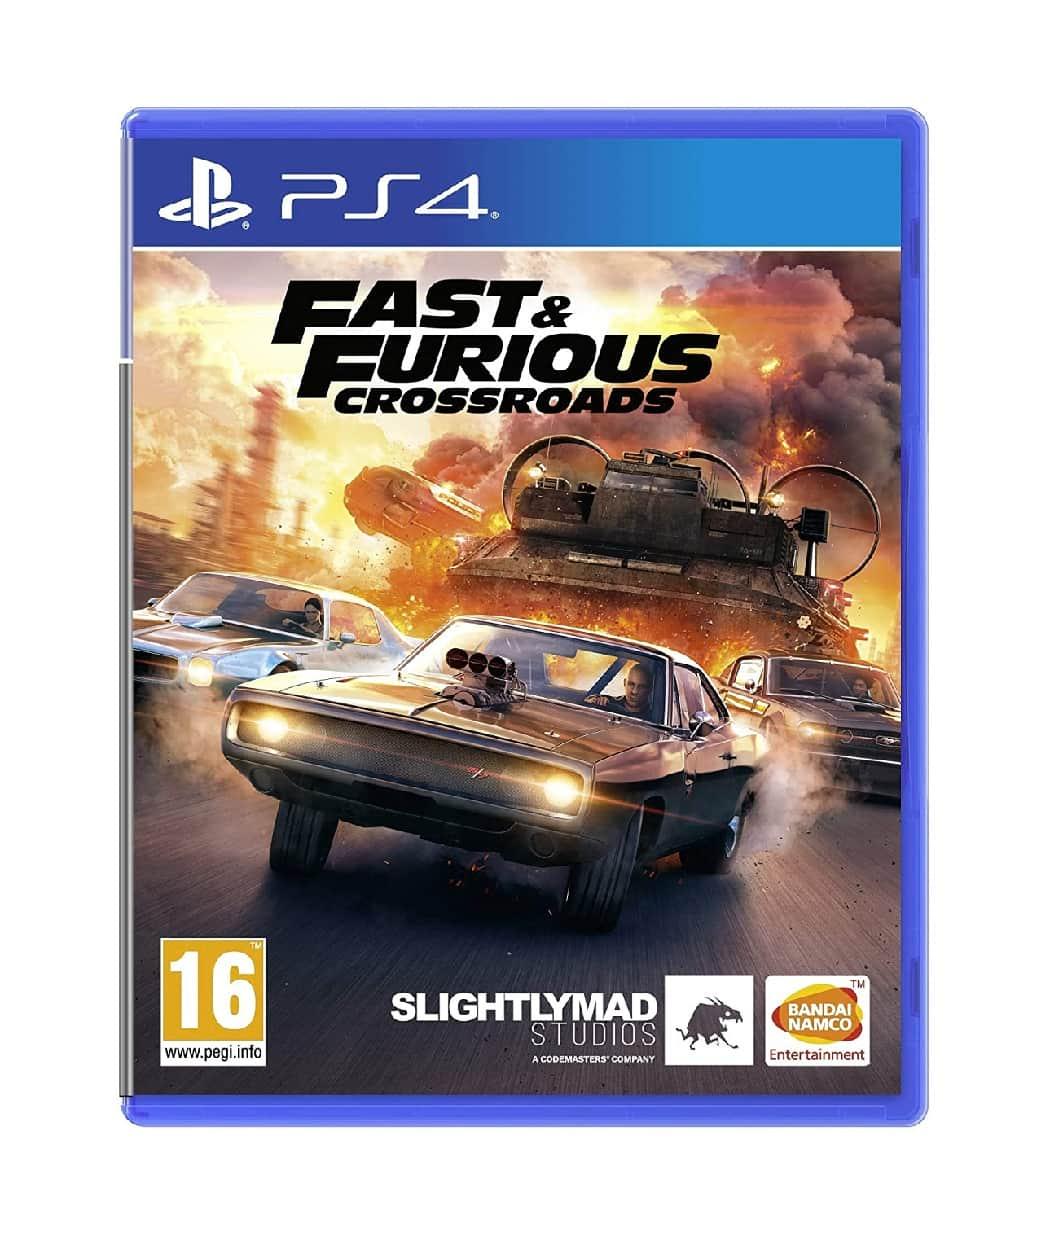 Fast & Furious Crossroads – Playstation 4